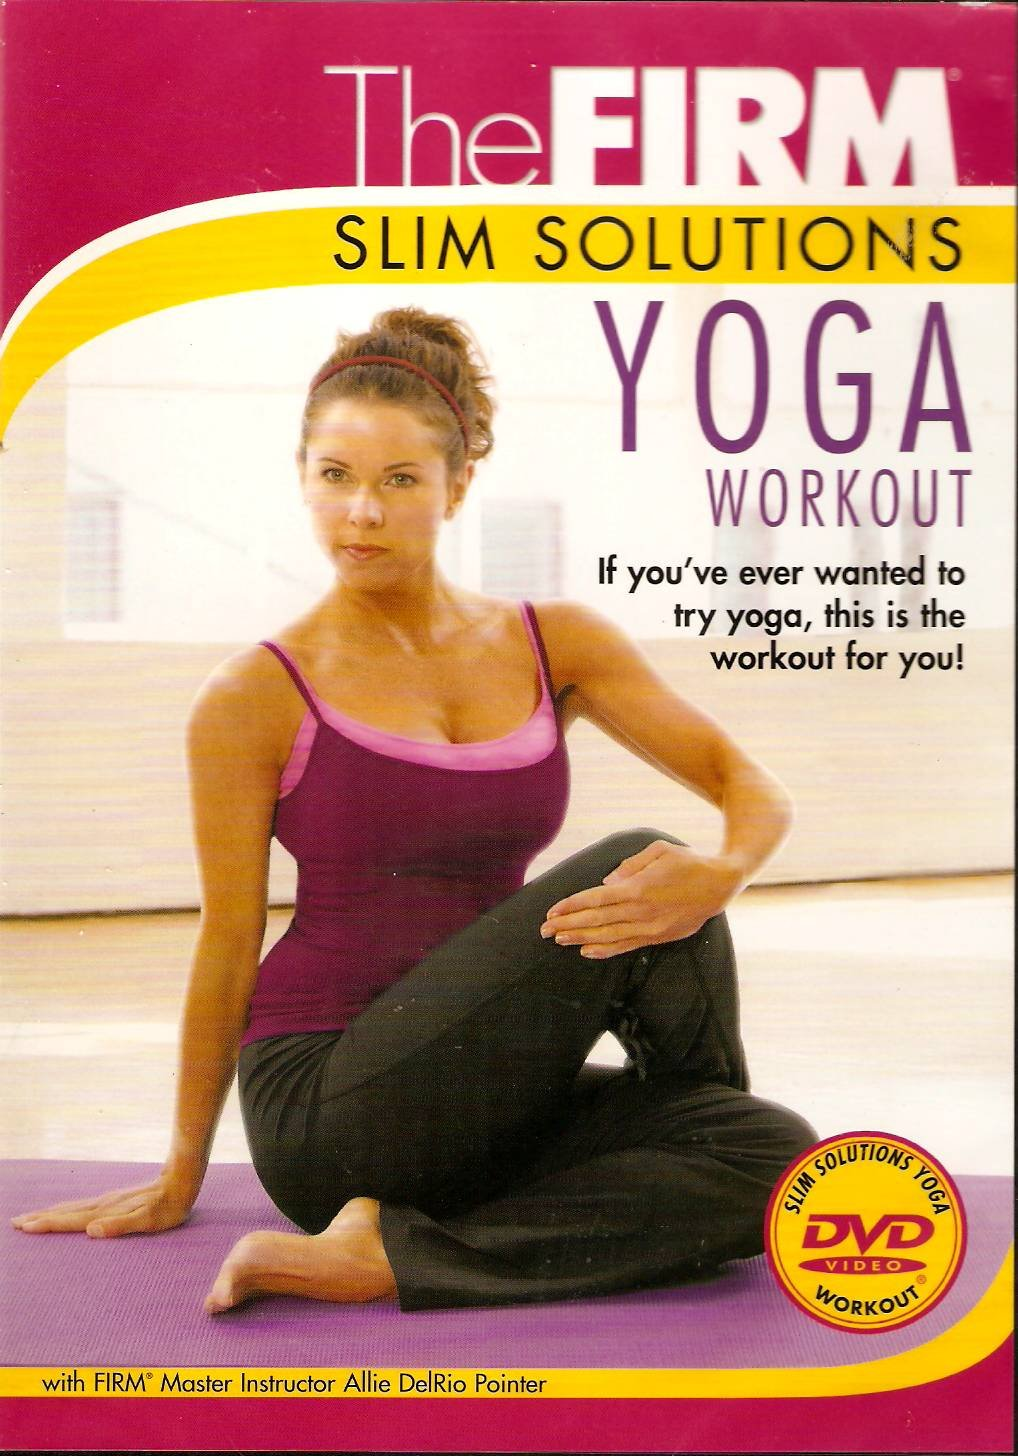 The FIRM - Slim Solutions Yoga Workout: Amazon.es: Cine y ...